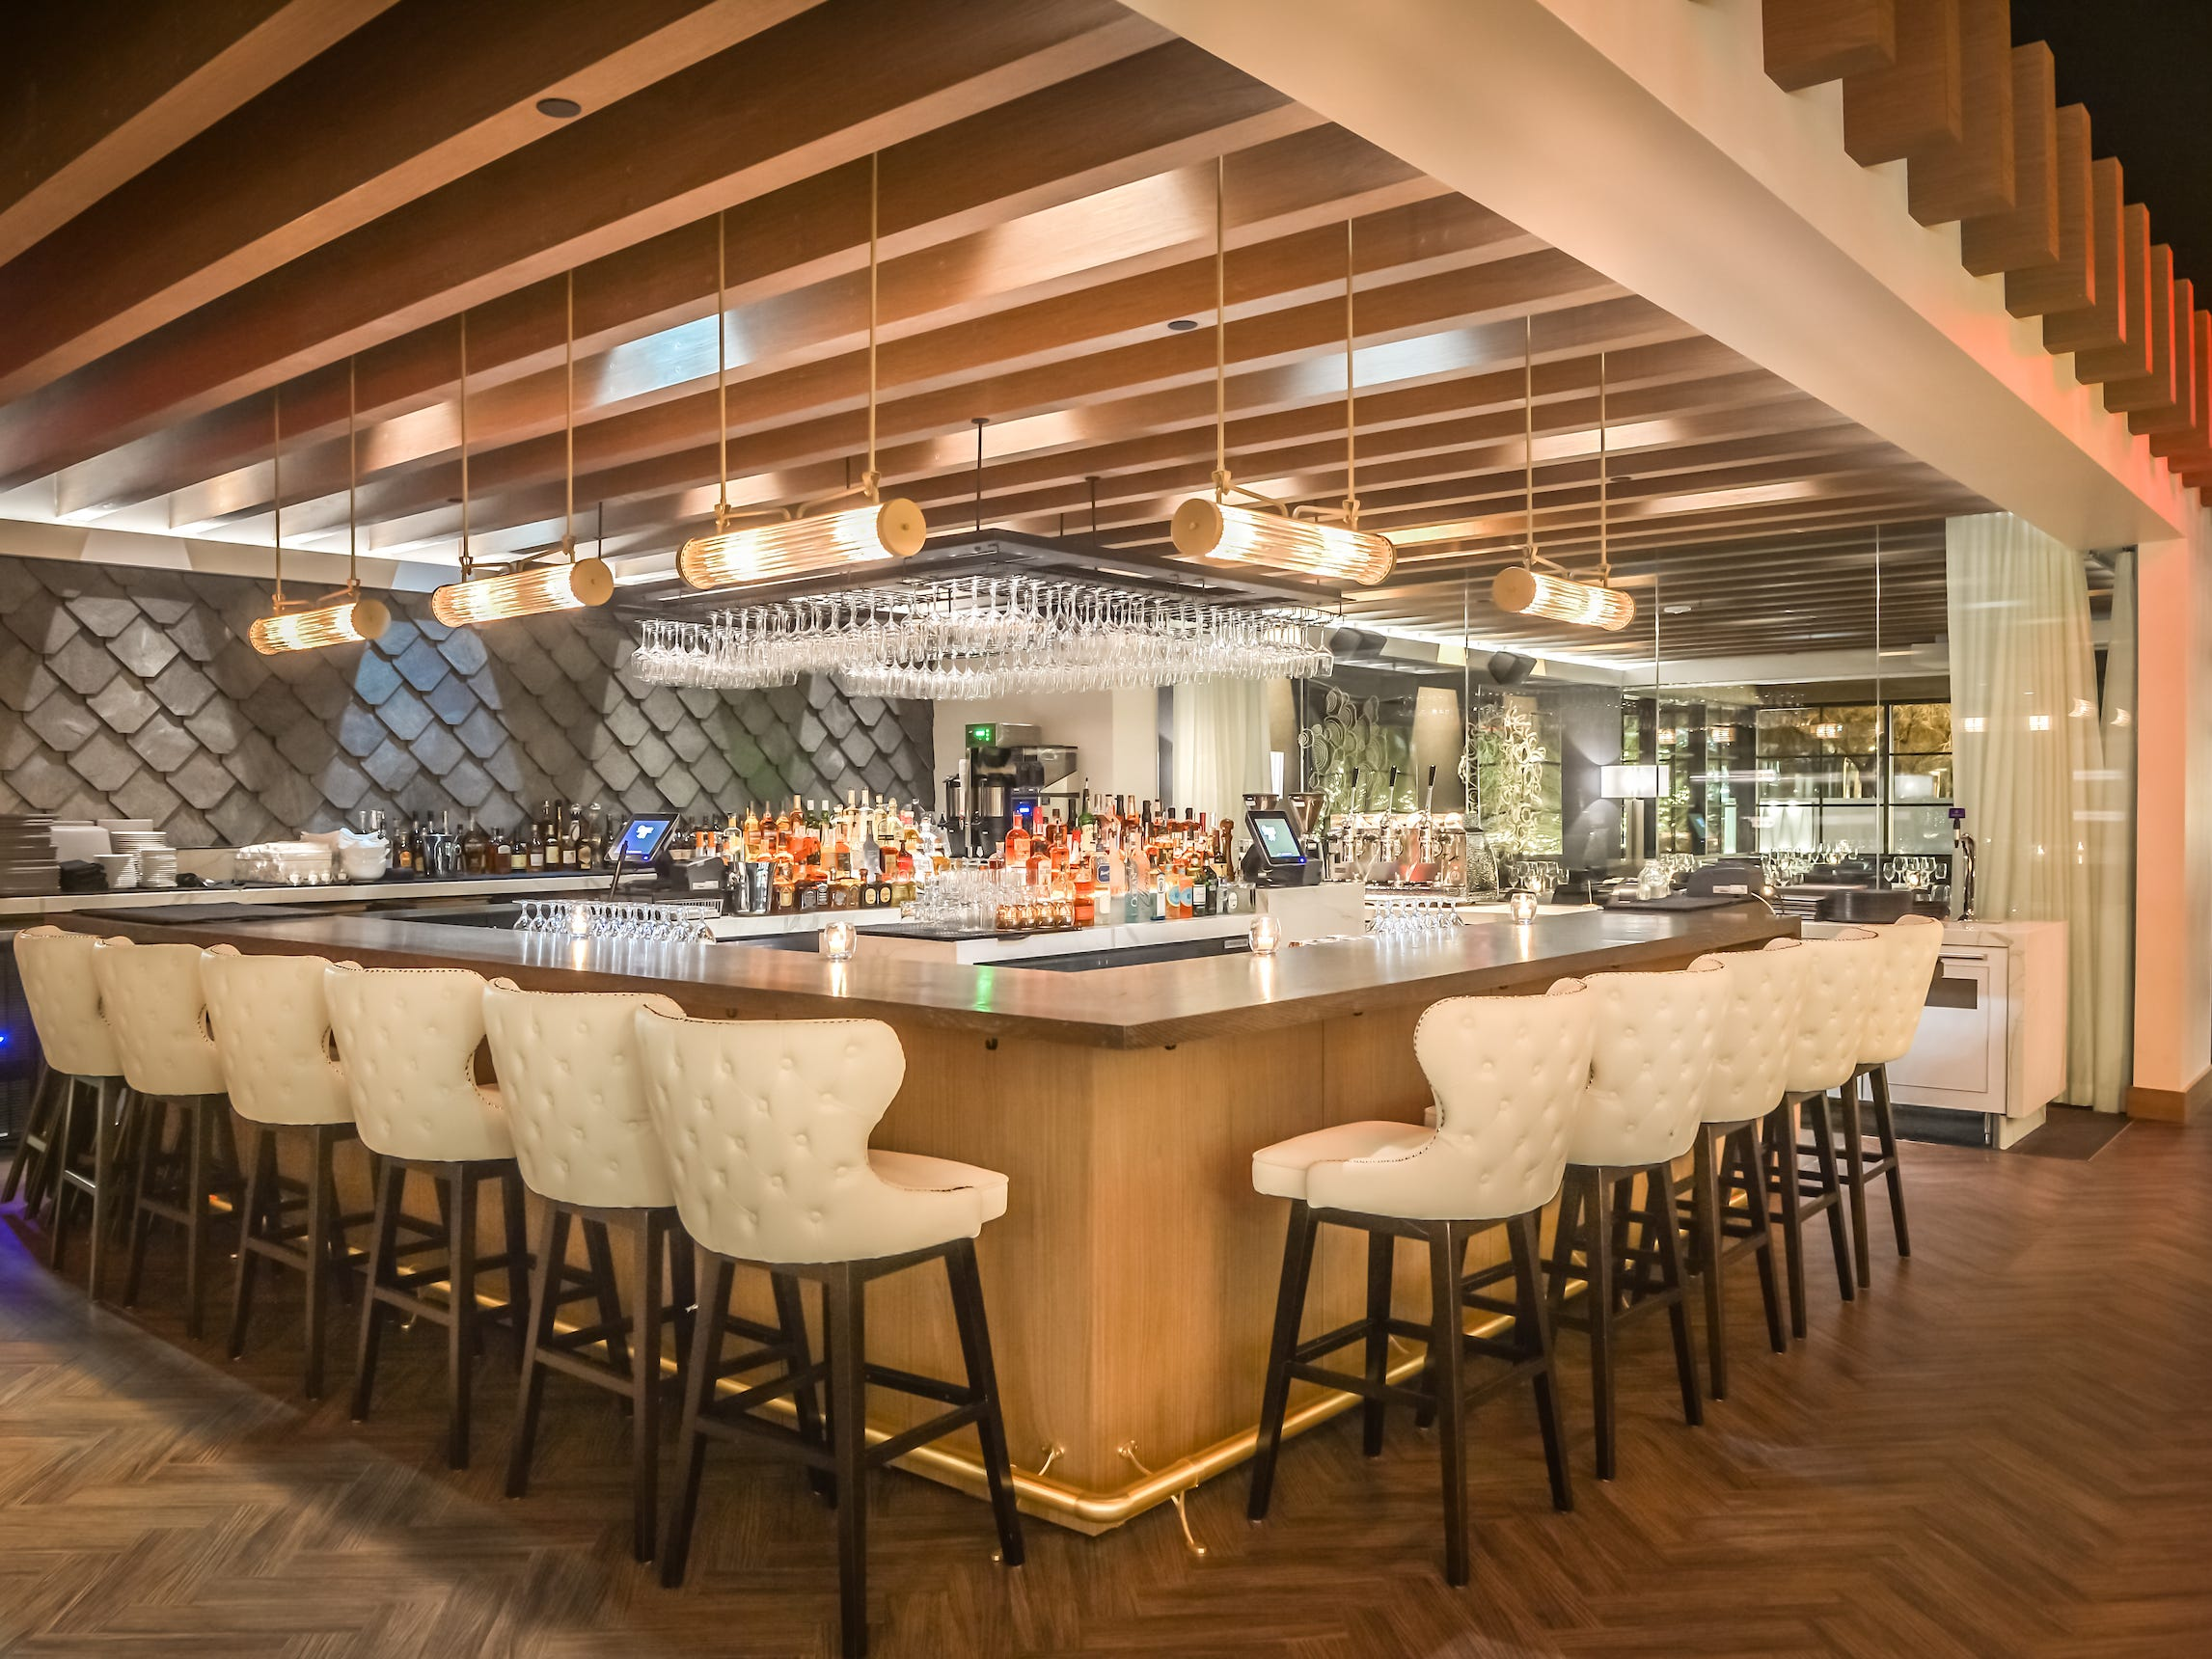 The bar inside Ocean 44 in Scottsdale.